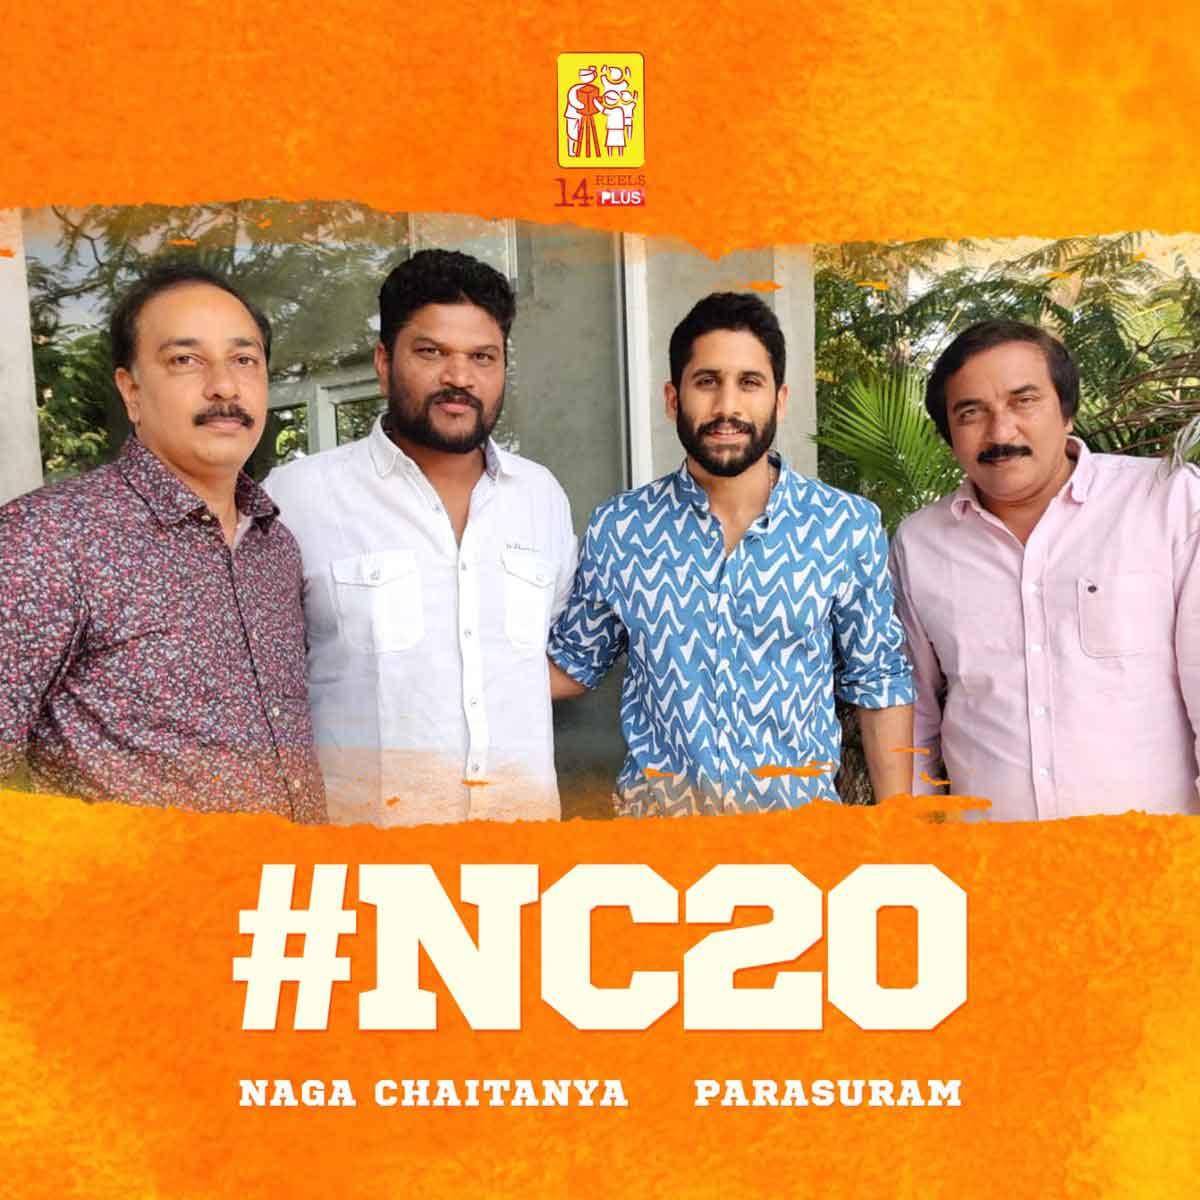 Naga Chaitanya's next